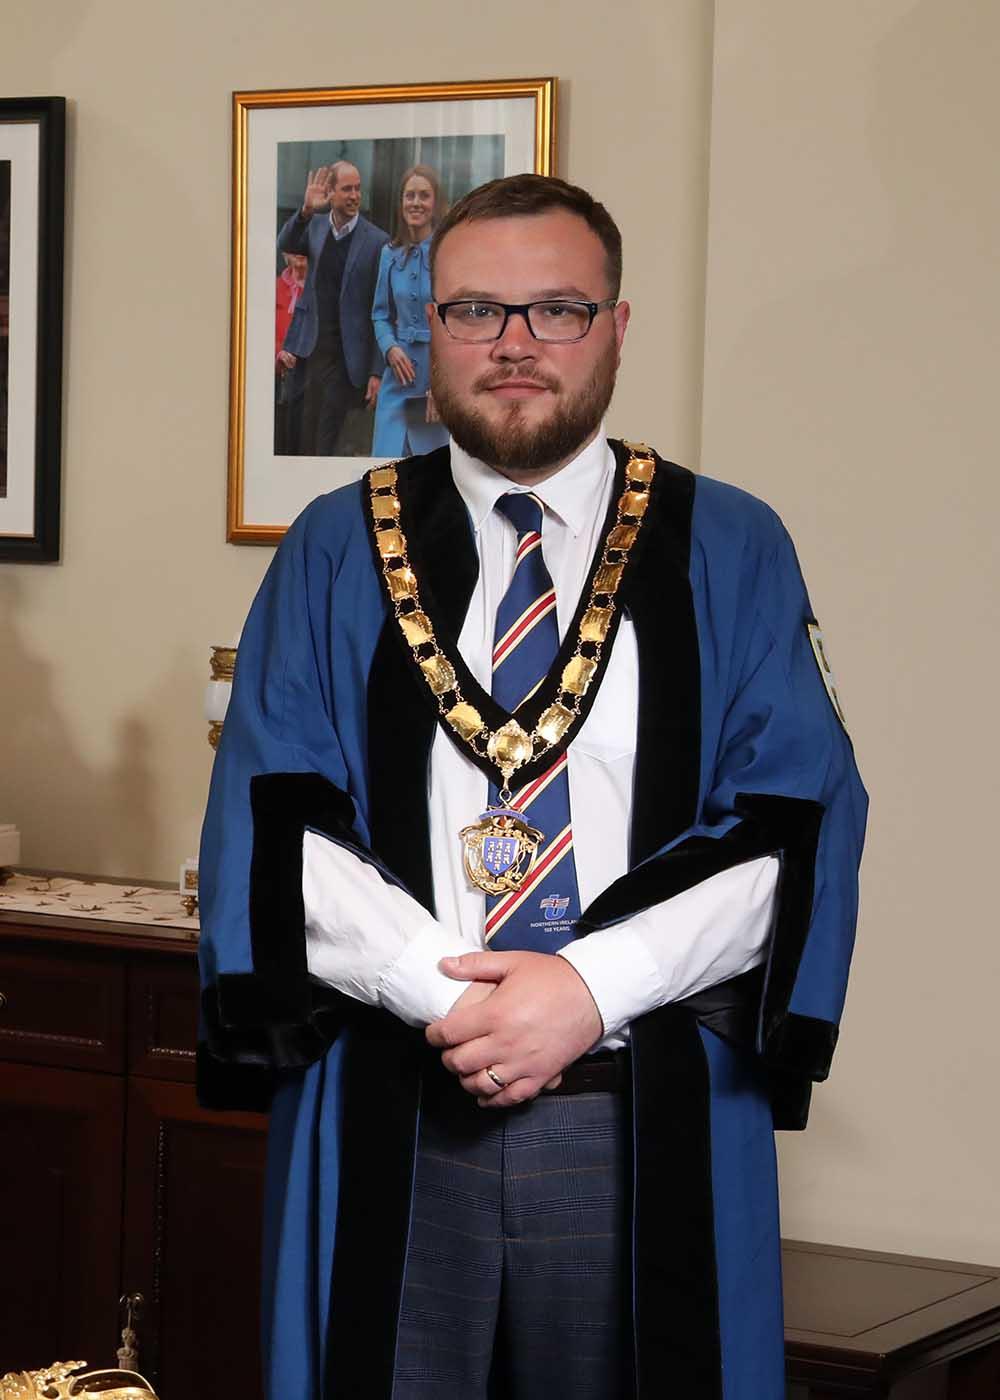 Deputy Mayor of Mid & East Antrim, Councillor Matthew Armstrong